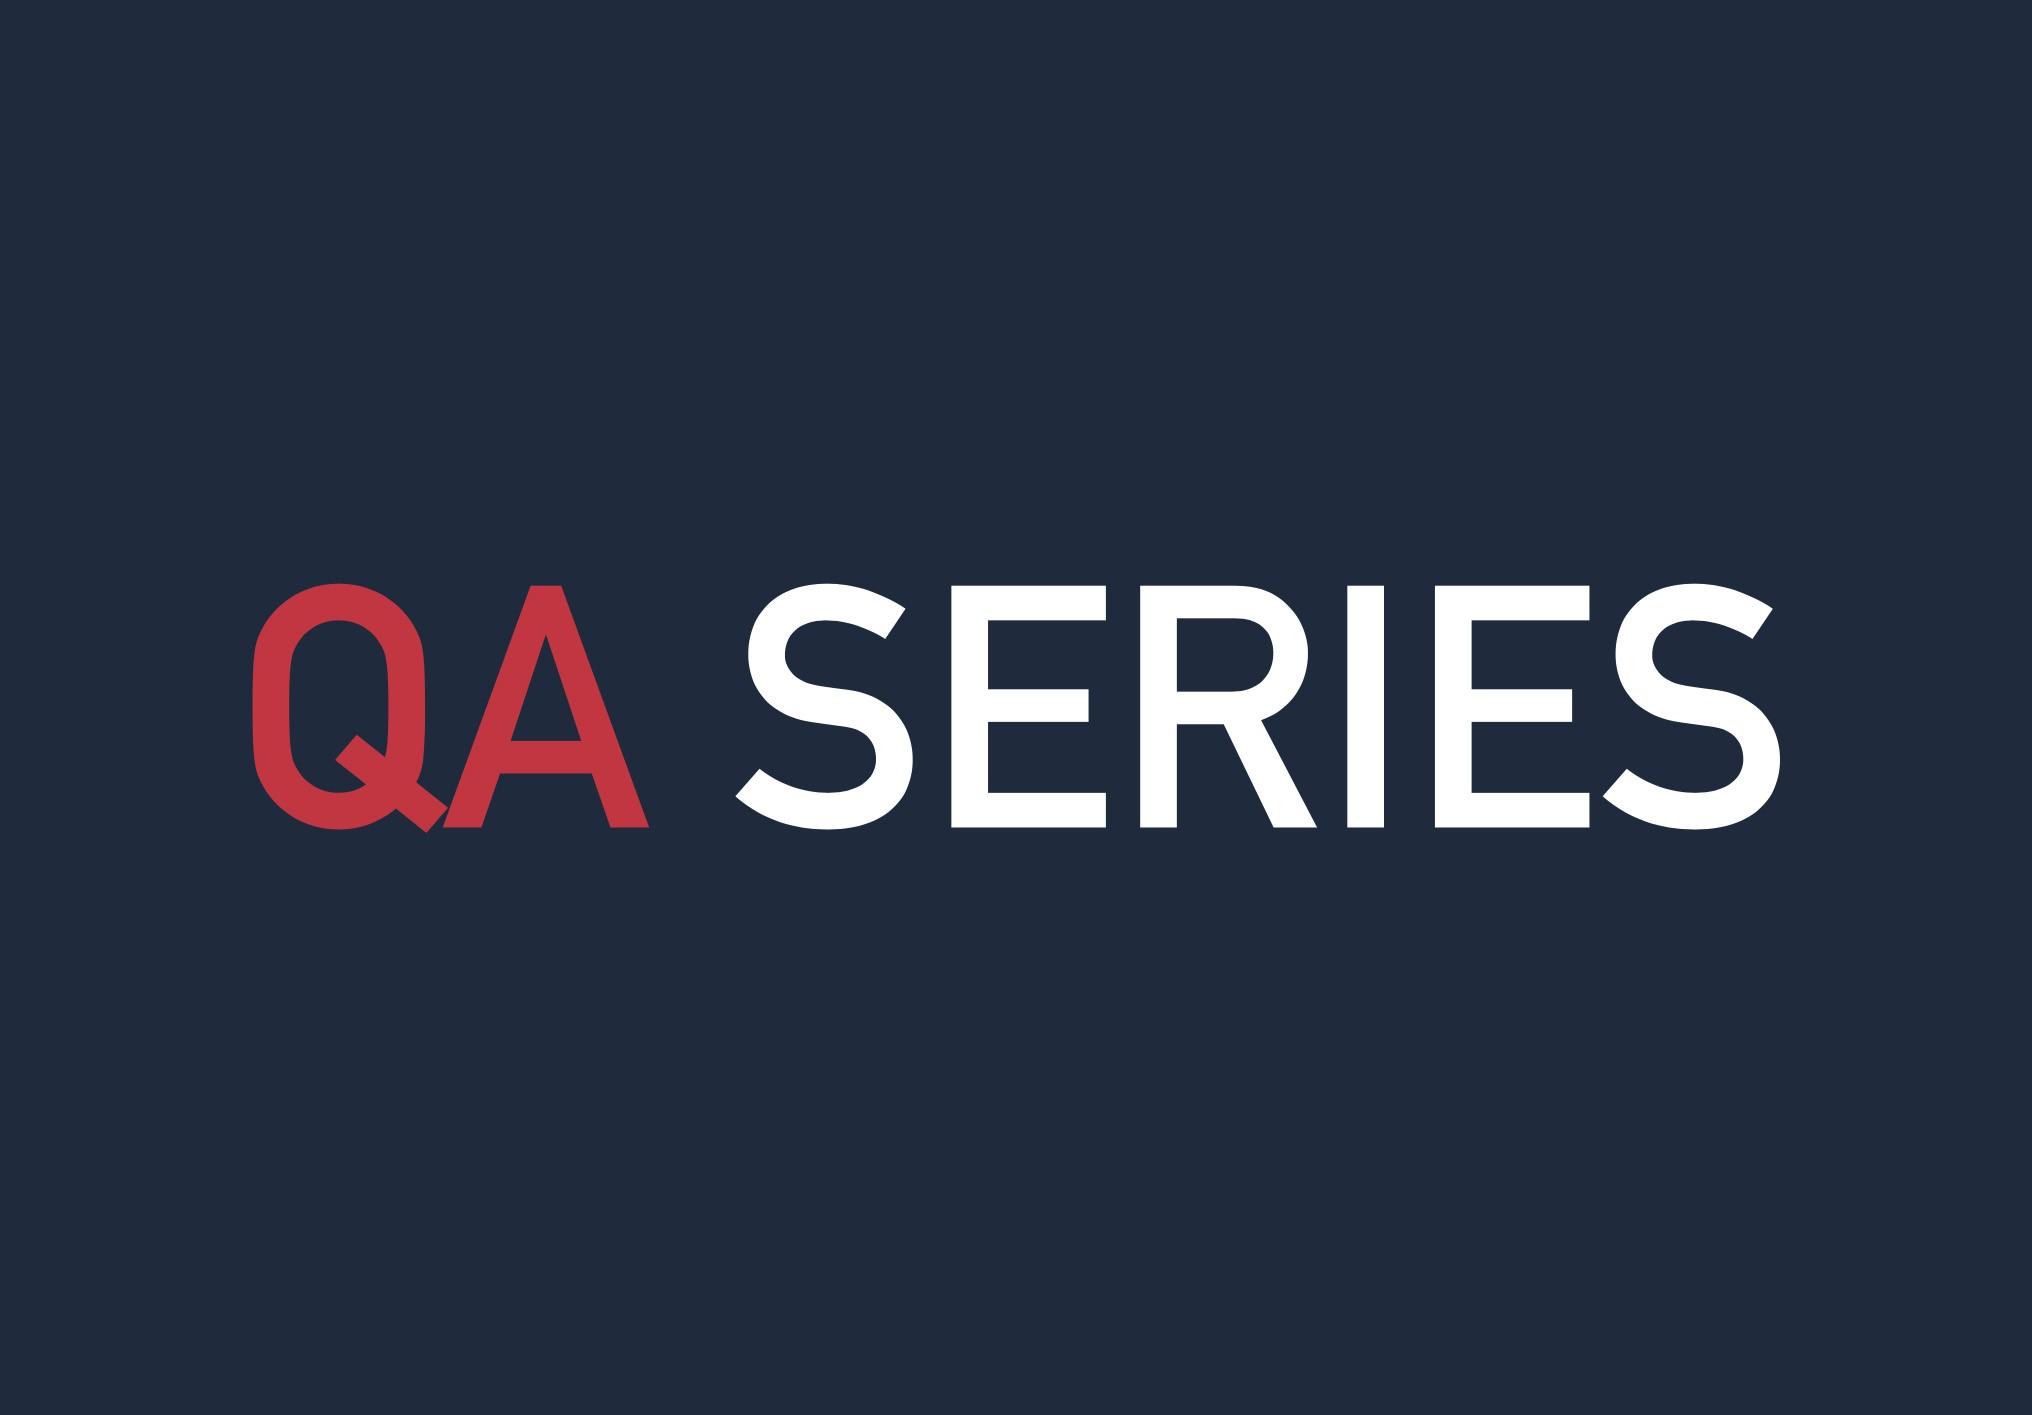 QA Series